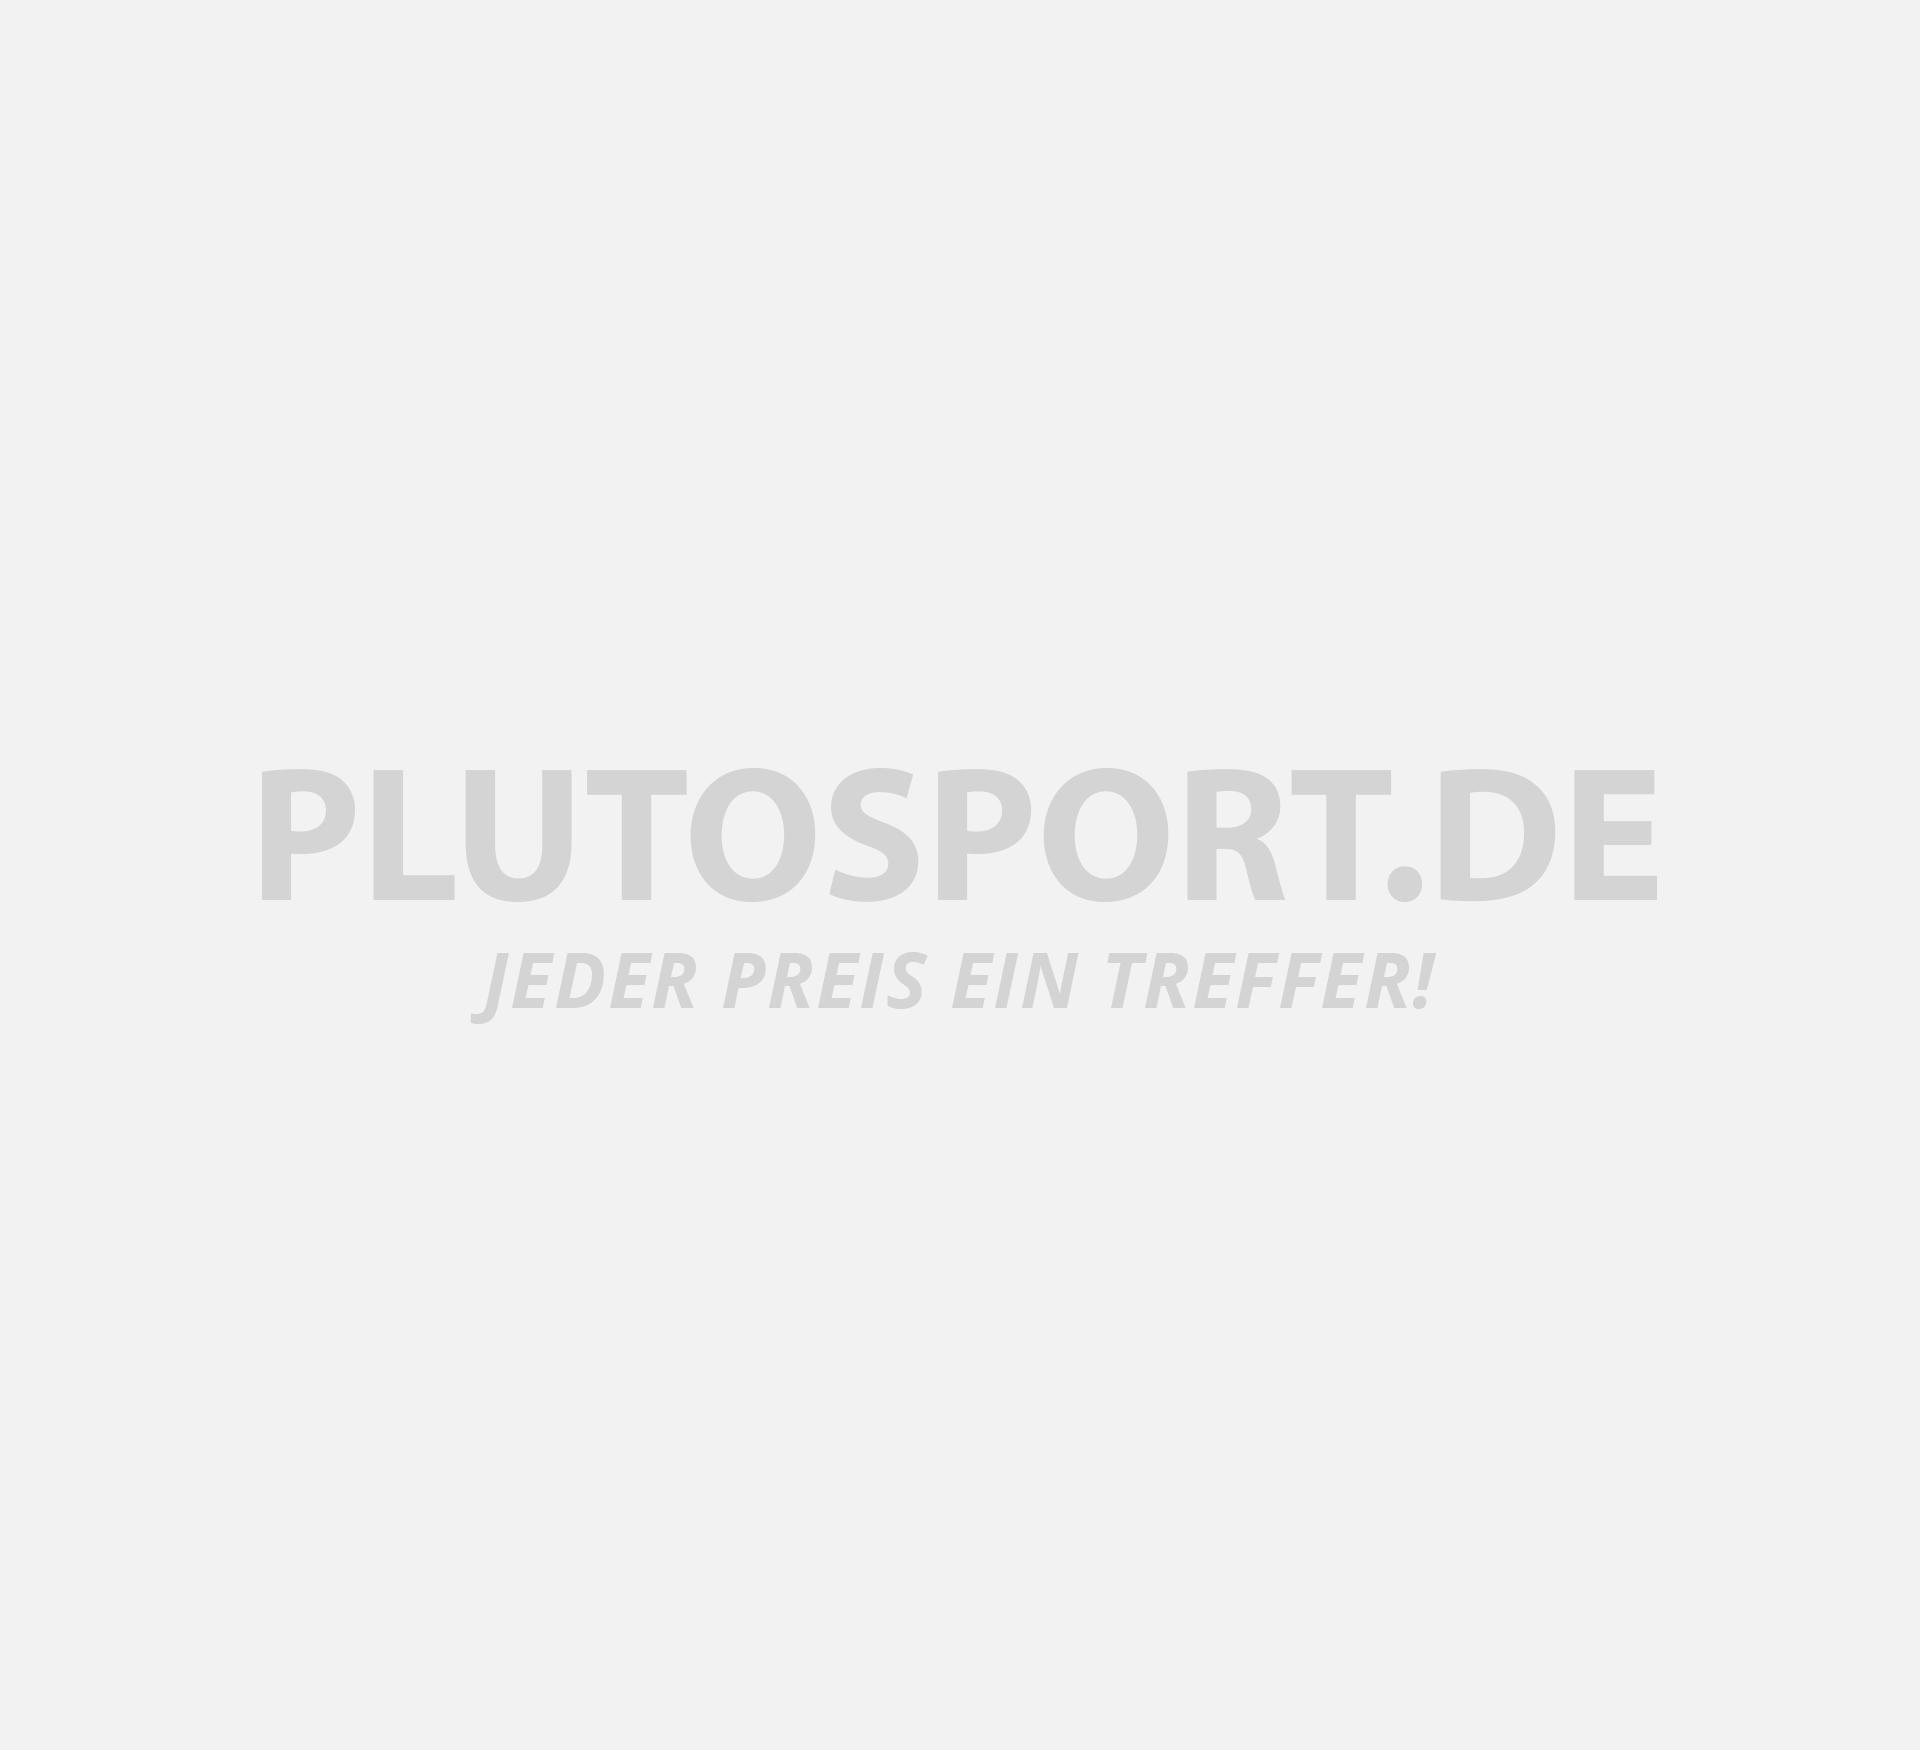 Adidas Grau Leinen Niedrige Turnschuhe Herren : Marke Winter